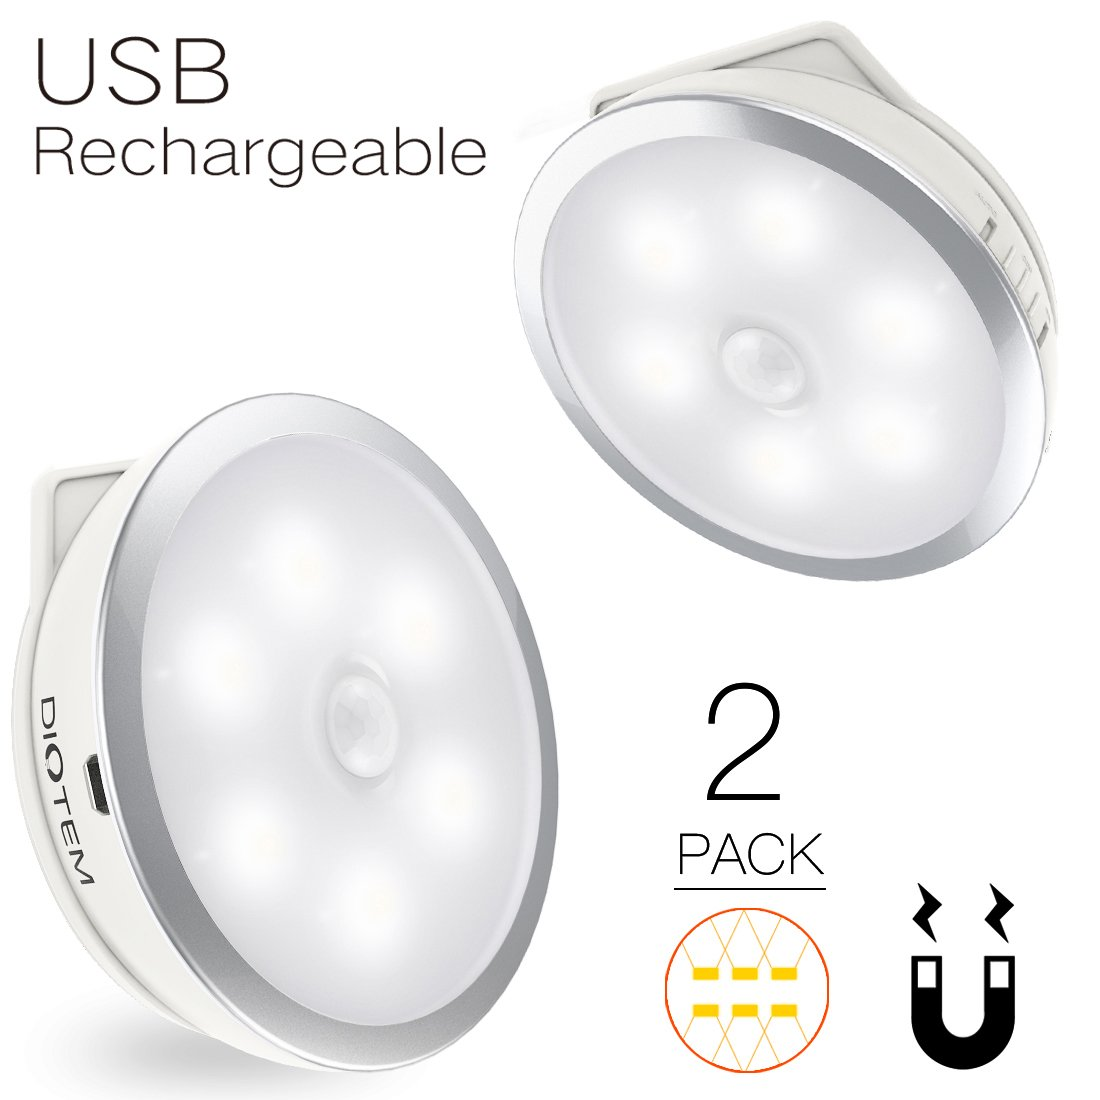 Motion Sensor Light, Diotem Rechargeable Motion Sensor Light usb Rechargeable, 2Pack 3Models Motion Light Sensor Light for Hallway/Bedroom/Closet,/Stairs,5 Installation Methods